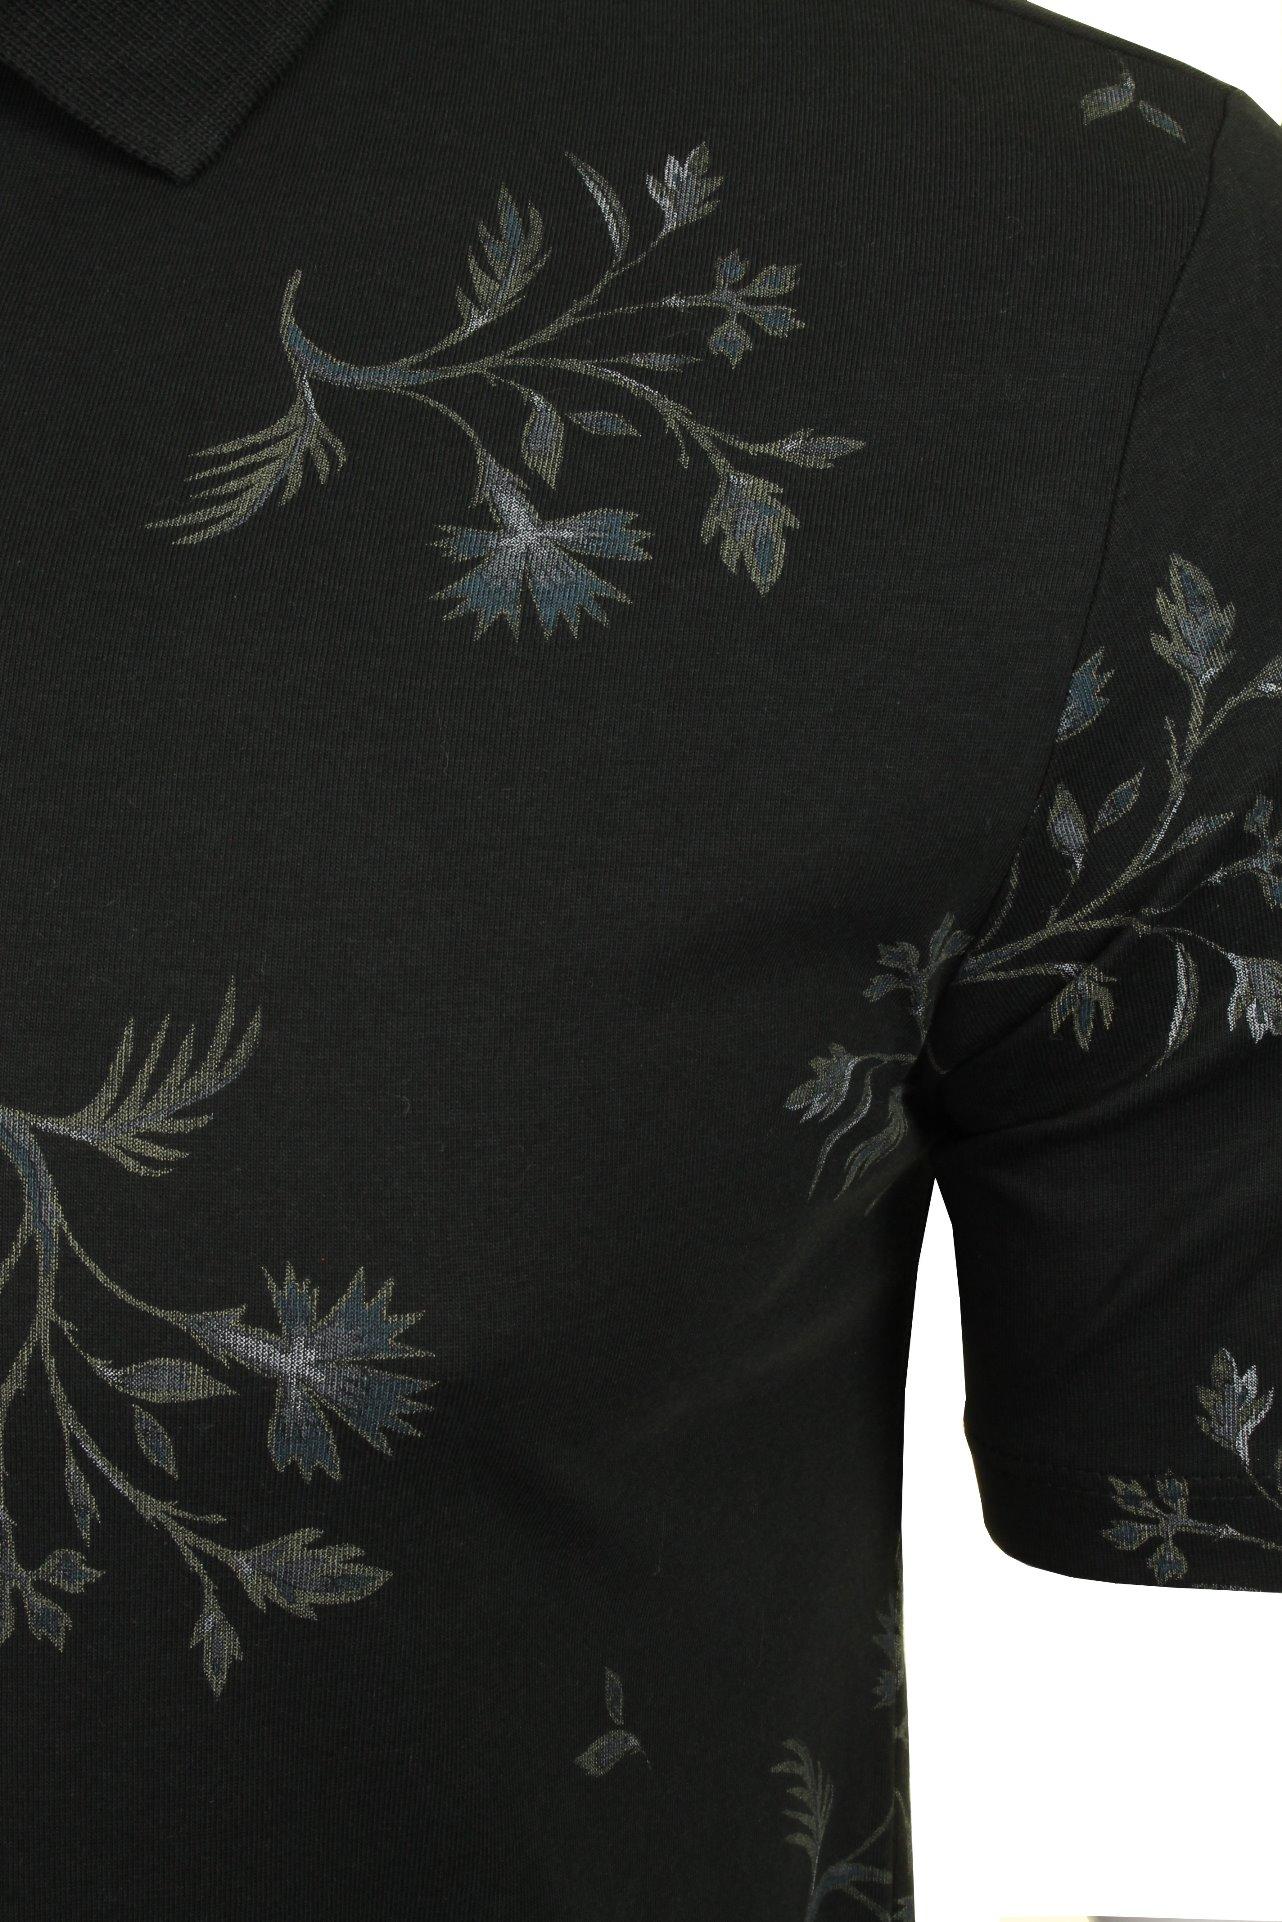 Jack-amp-Jones-Mens-Shirt-039-JPRJAMES-039-Short-Sleeved thumbnail 4